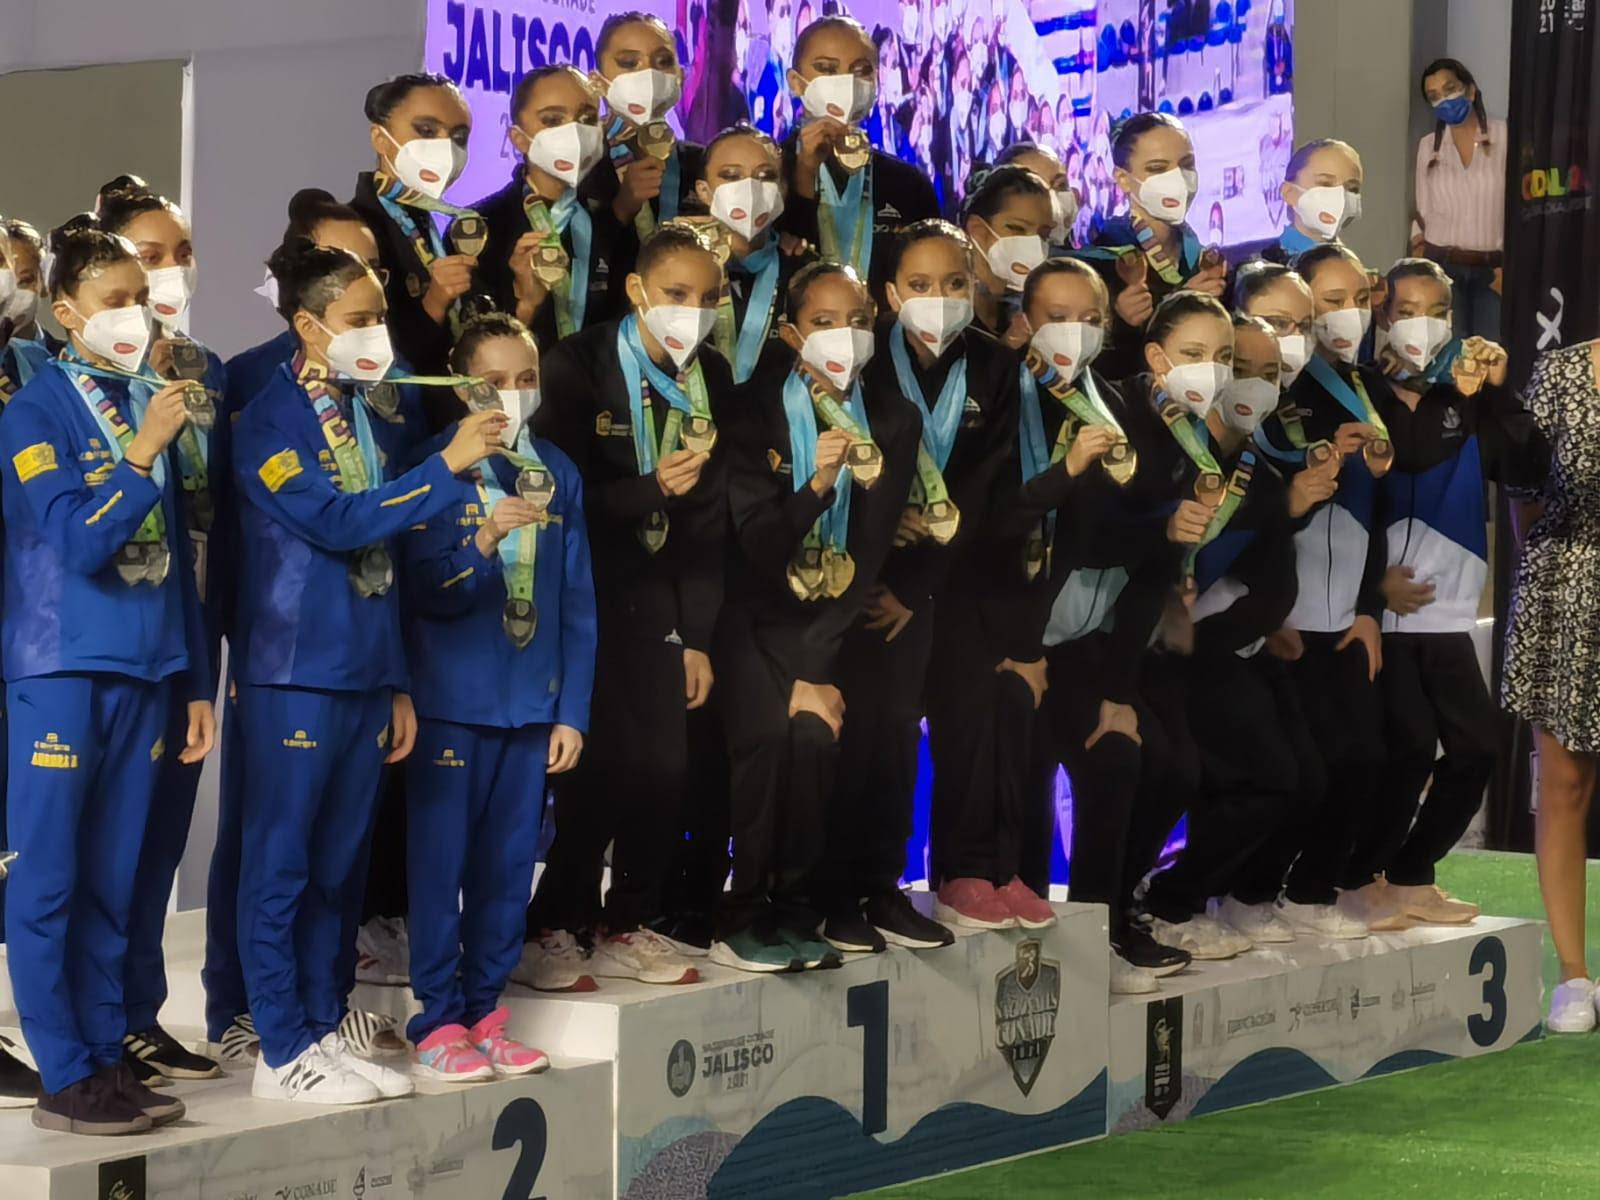 Selección mexiquense de natación destaca en Juegos Nacionales Conade 2021 - Jul 20, 2021